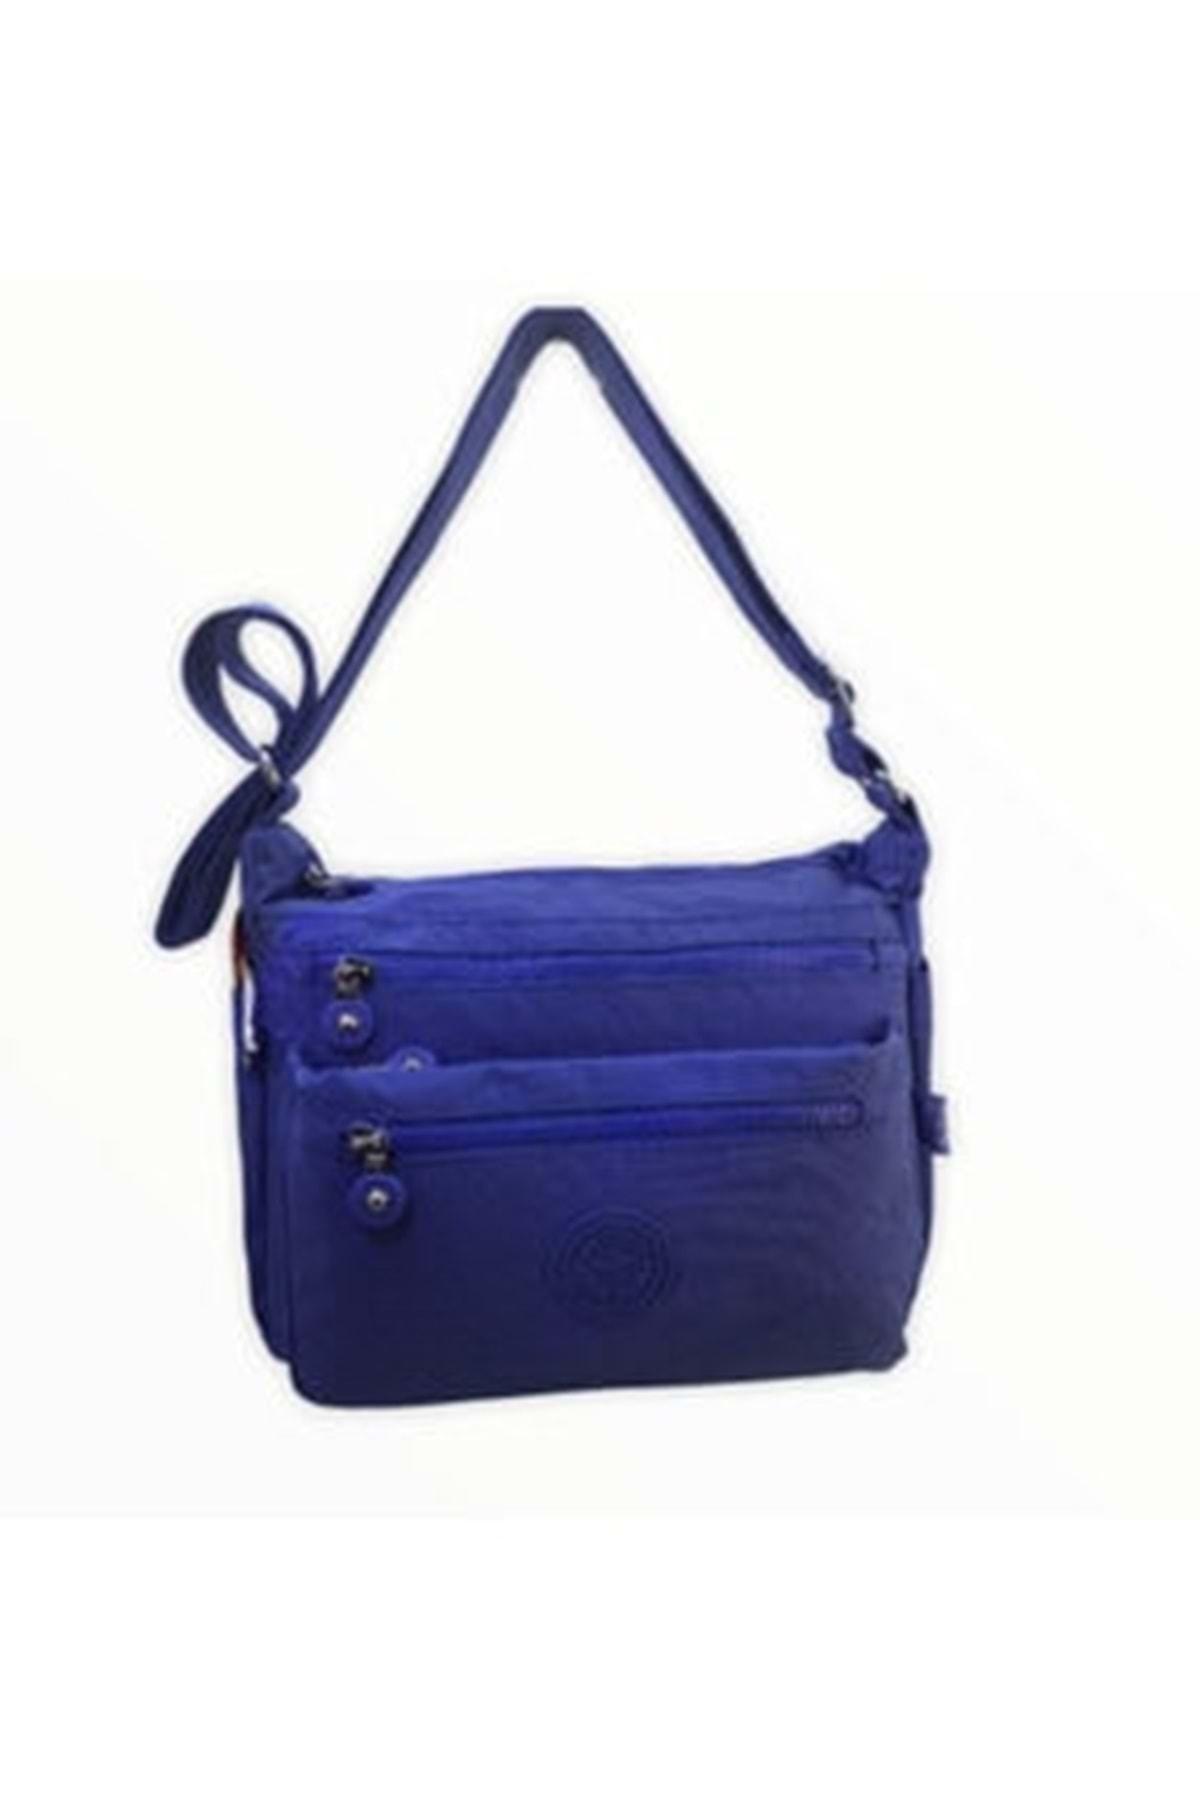 SMART BAGS 1238 - Mavi - Orta Boy 2